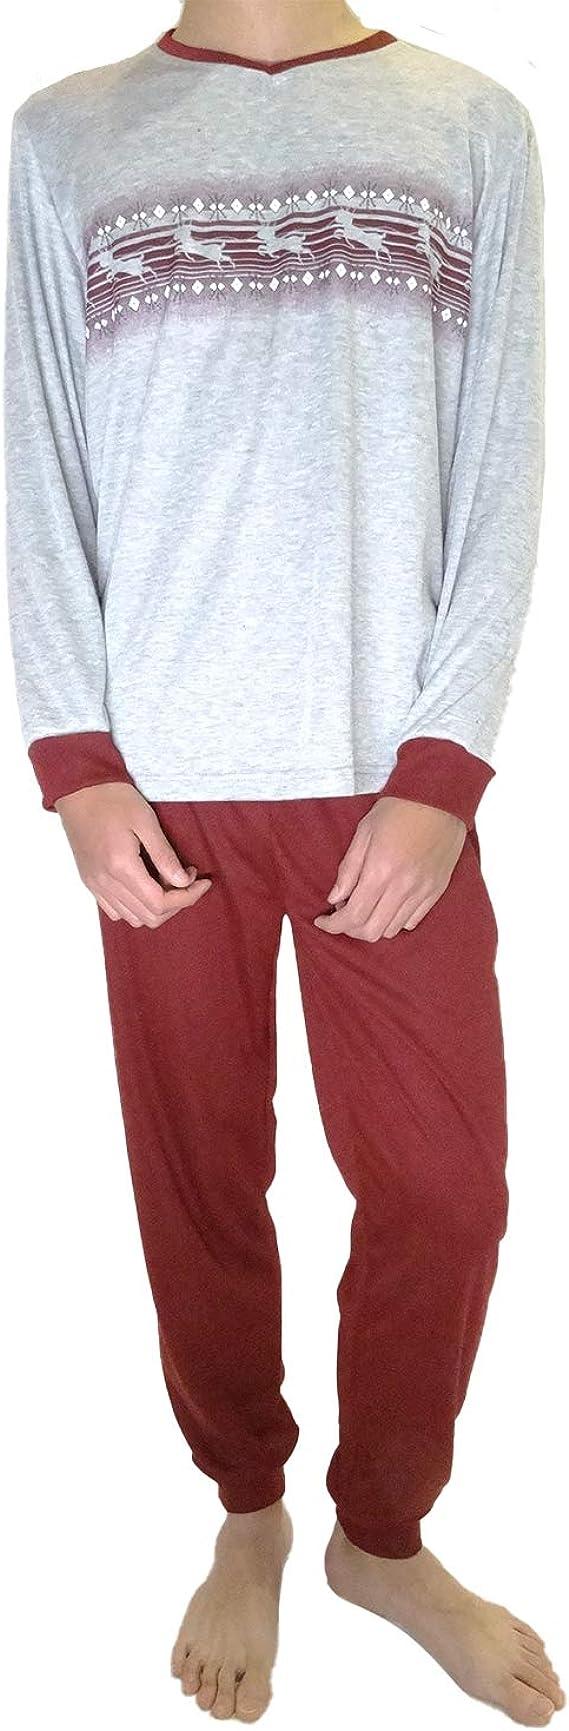 Mini kitten Pijama de Caballero Hombre de Algodon Fino Manga Larga con Pantalon Largo y de Cuello Pico//Ropa para Dormir de Hombre